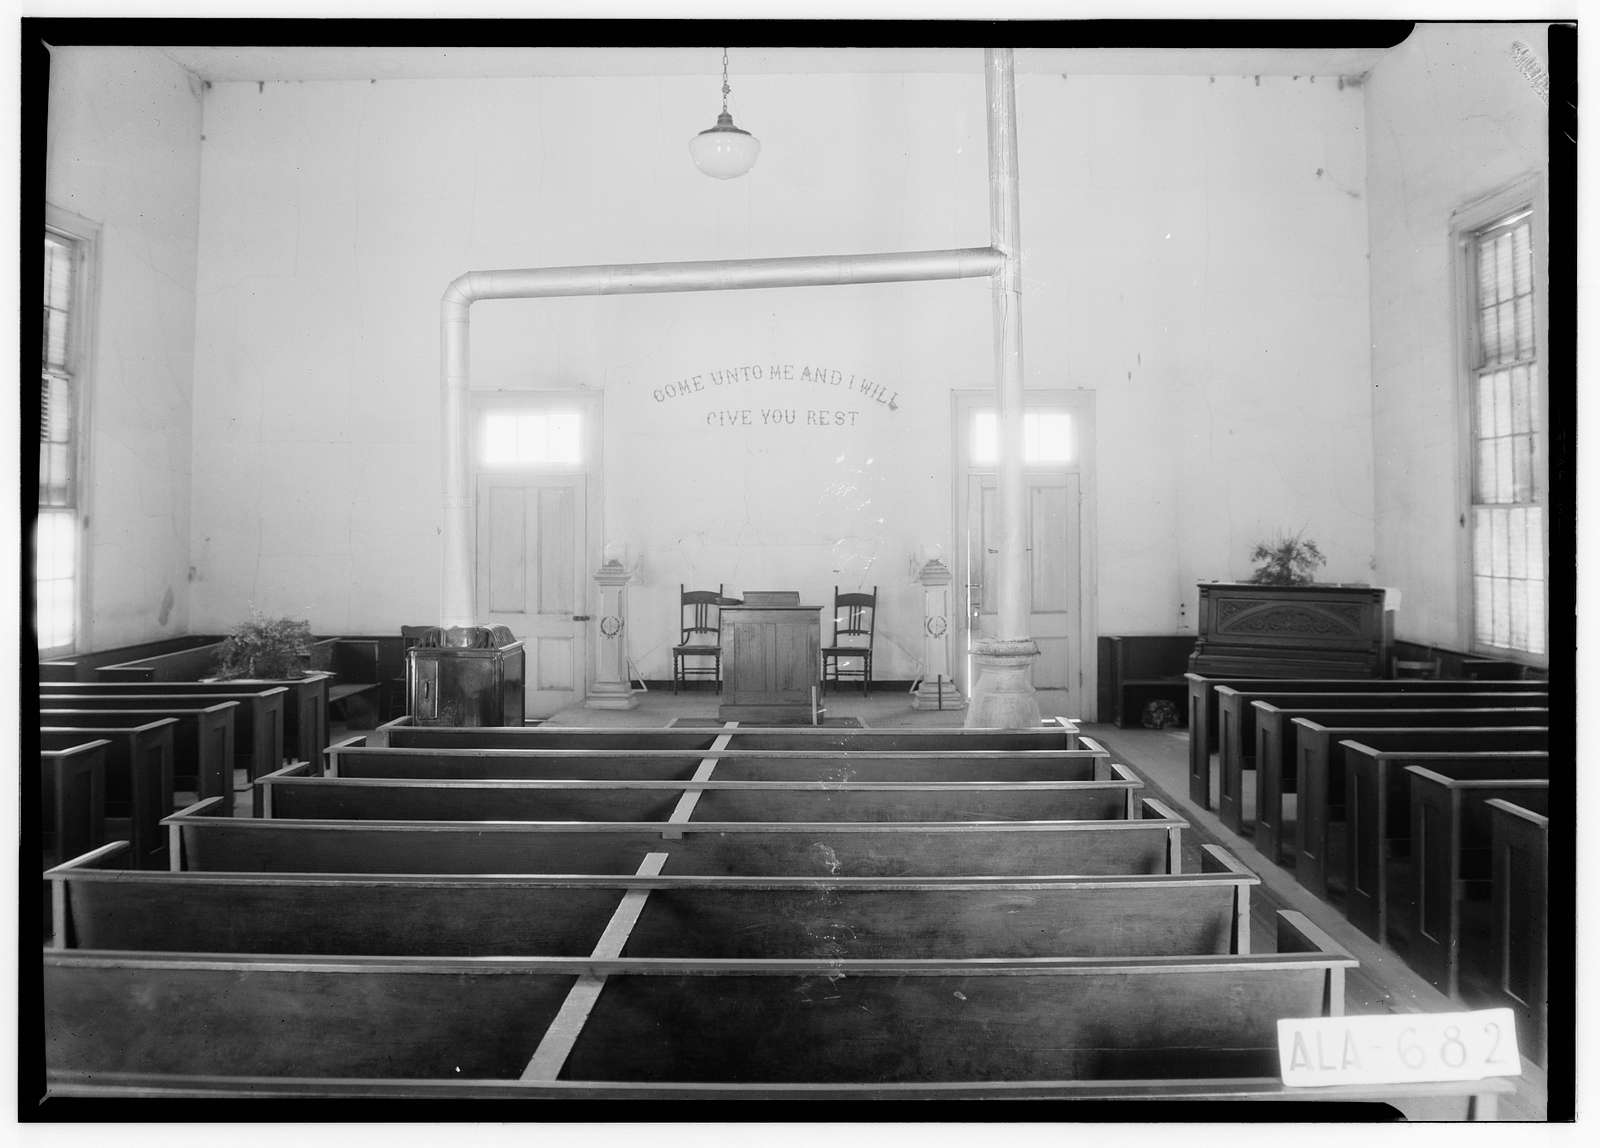 Methodist Church, State Route 143, Robinson Springs, Elmore County, AL